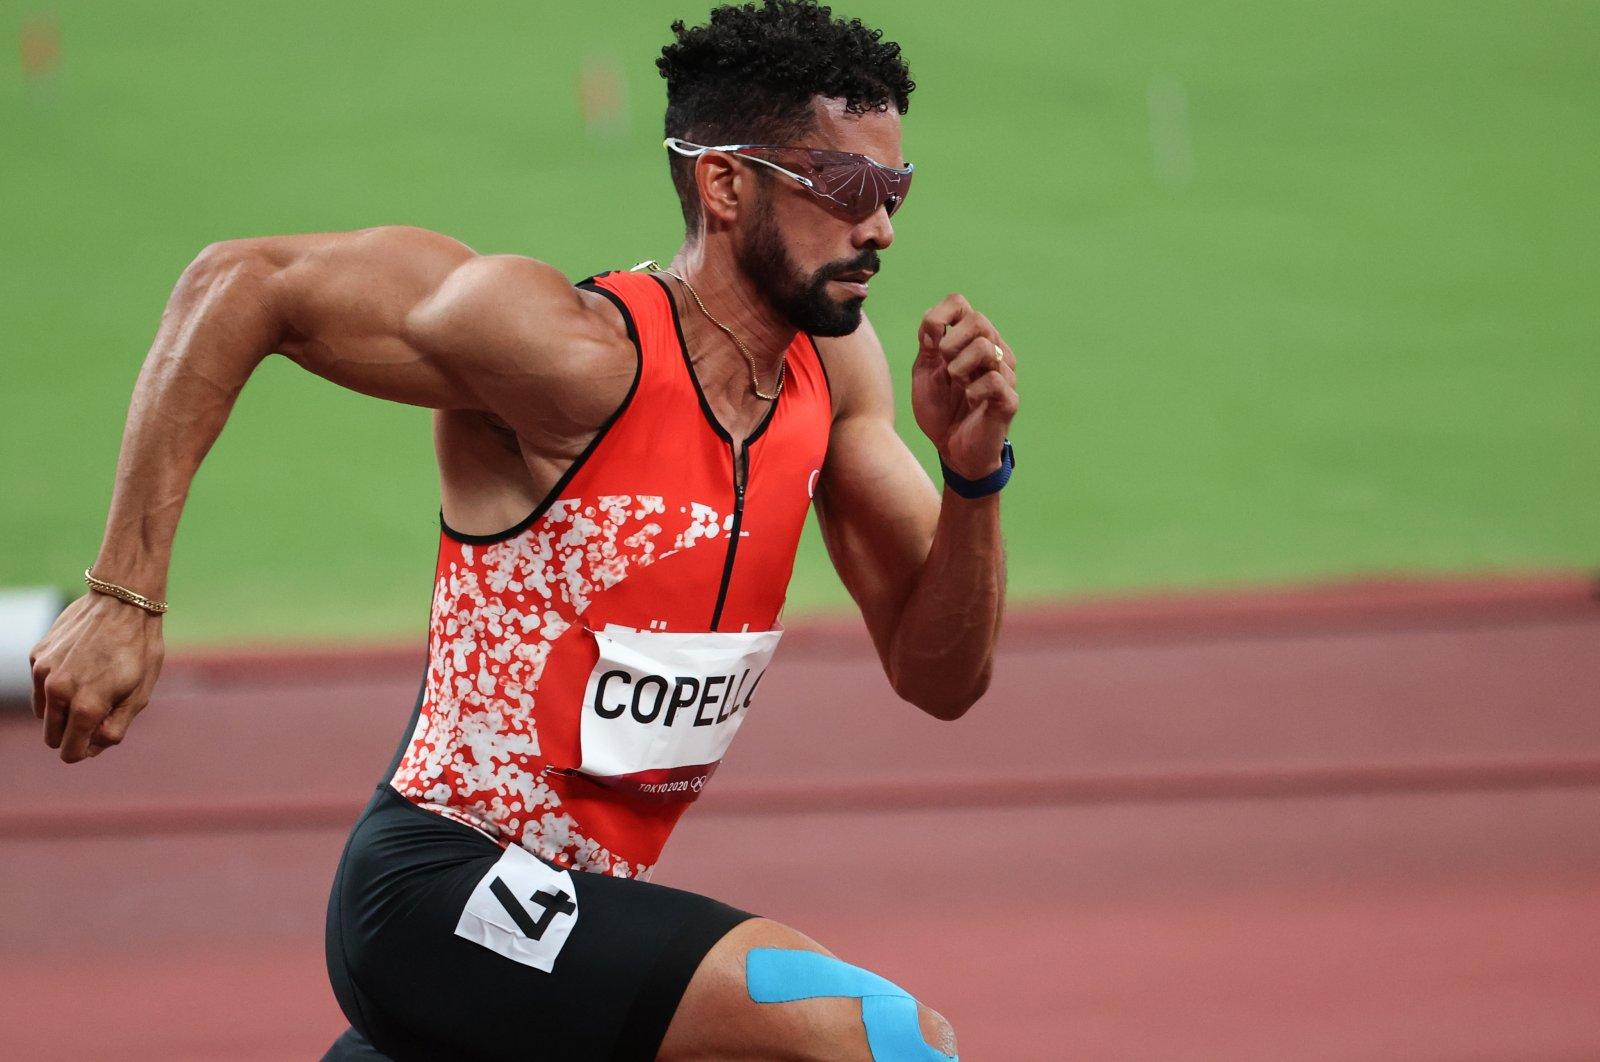 Turkish athlete Yasmani Copello Escobar in action at the Tokyo 2020 Olympics 400-meter hurdles semifinal, Tokyo, Japan, Aug. 1, 2021.